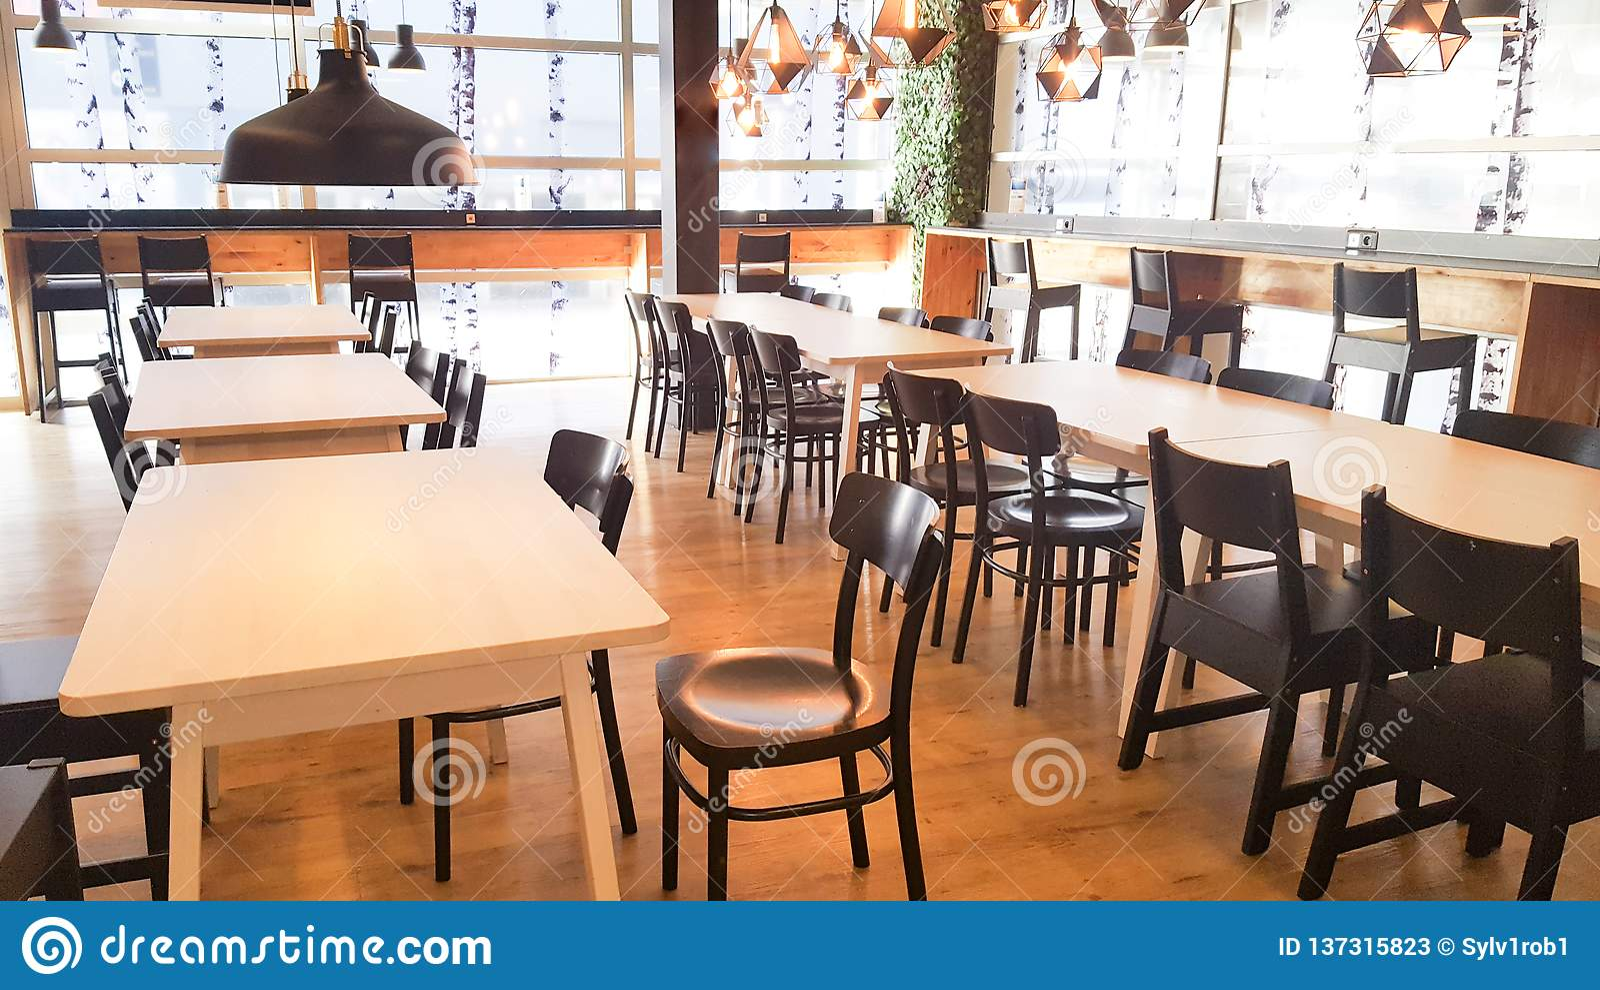 Modern Vintage Wood Restaurant Interior Design Stock Image Image Of Dining Dinner 137315823